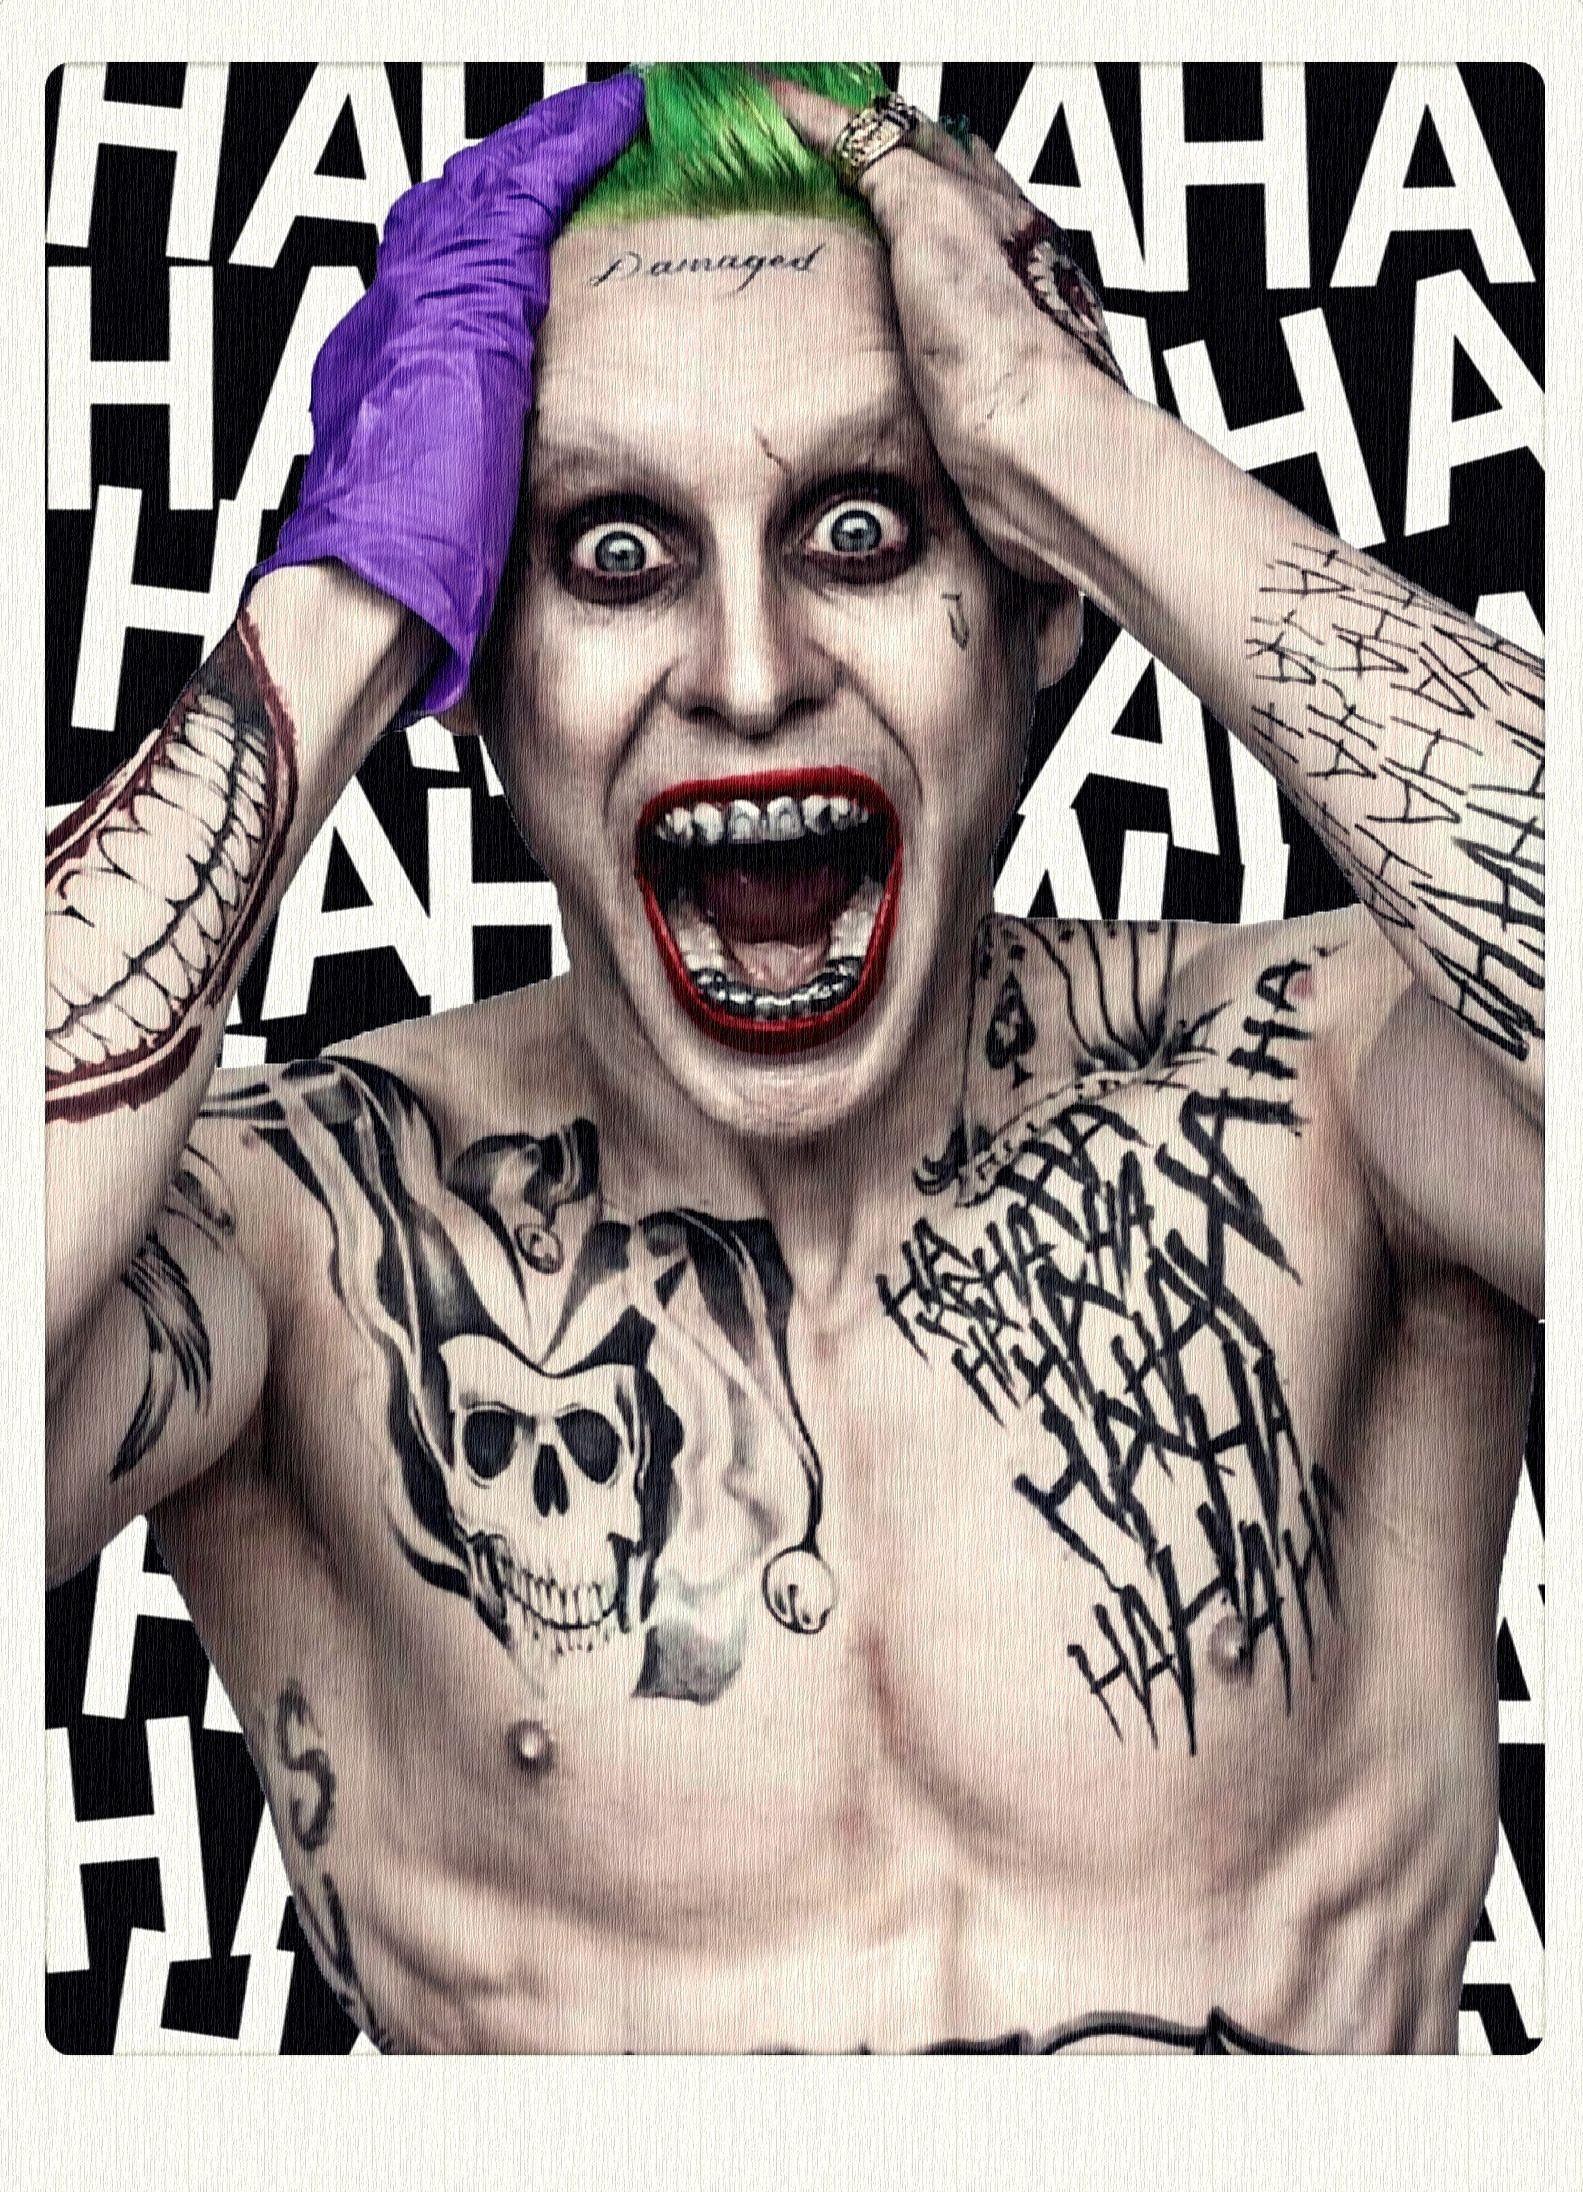 Suicide Squad (2016) Jared Leto Joker Movies IMDB